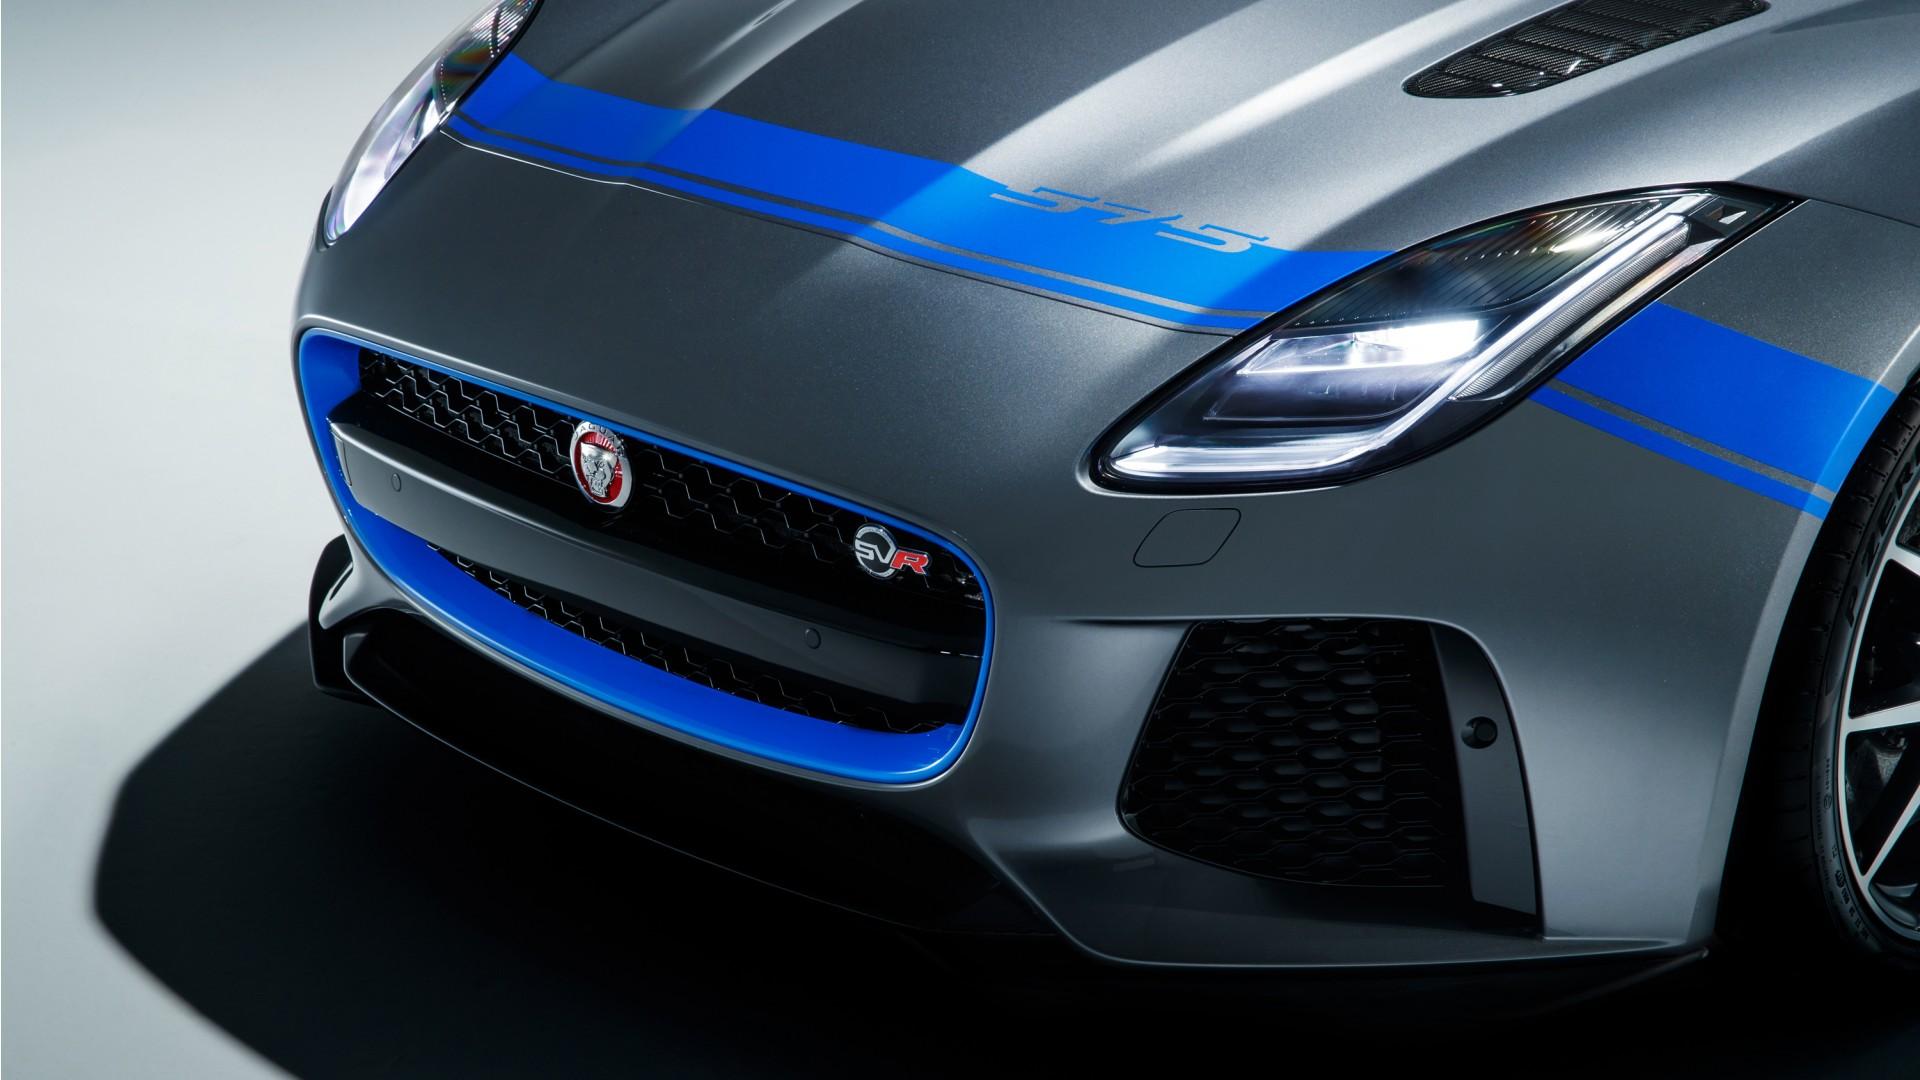 Hummer Car Images For Wallpaper 2018 Jaguar F Type Svr Graphic Pack Coupe 2 Wallpaper Hd